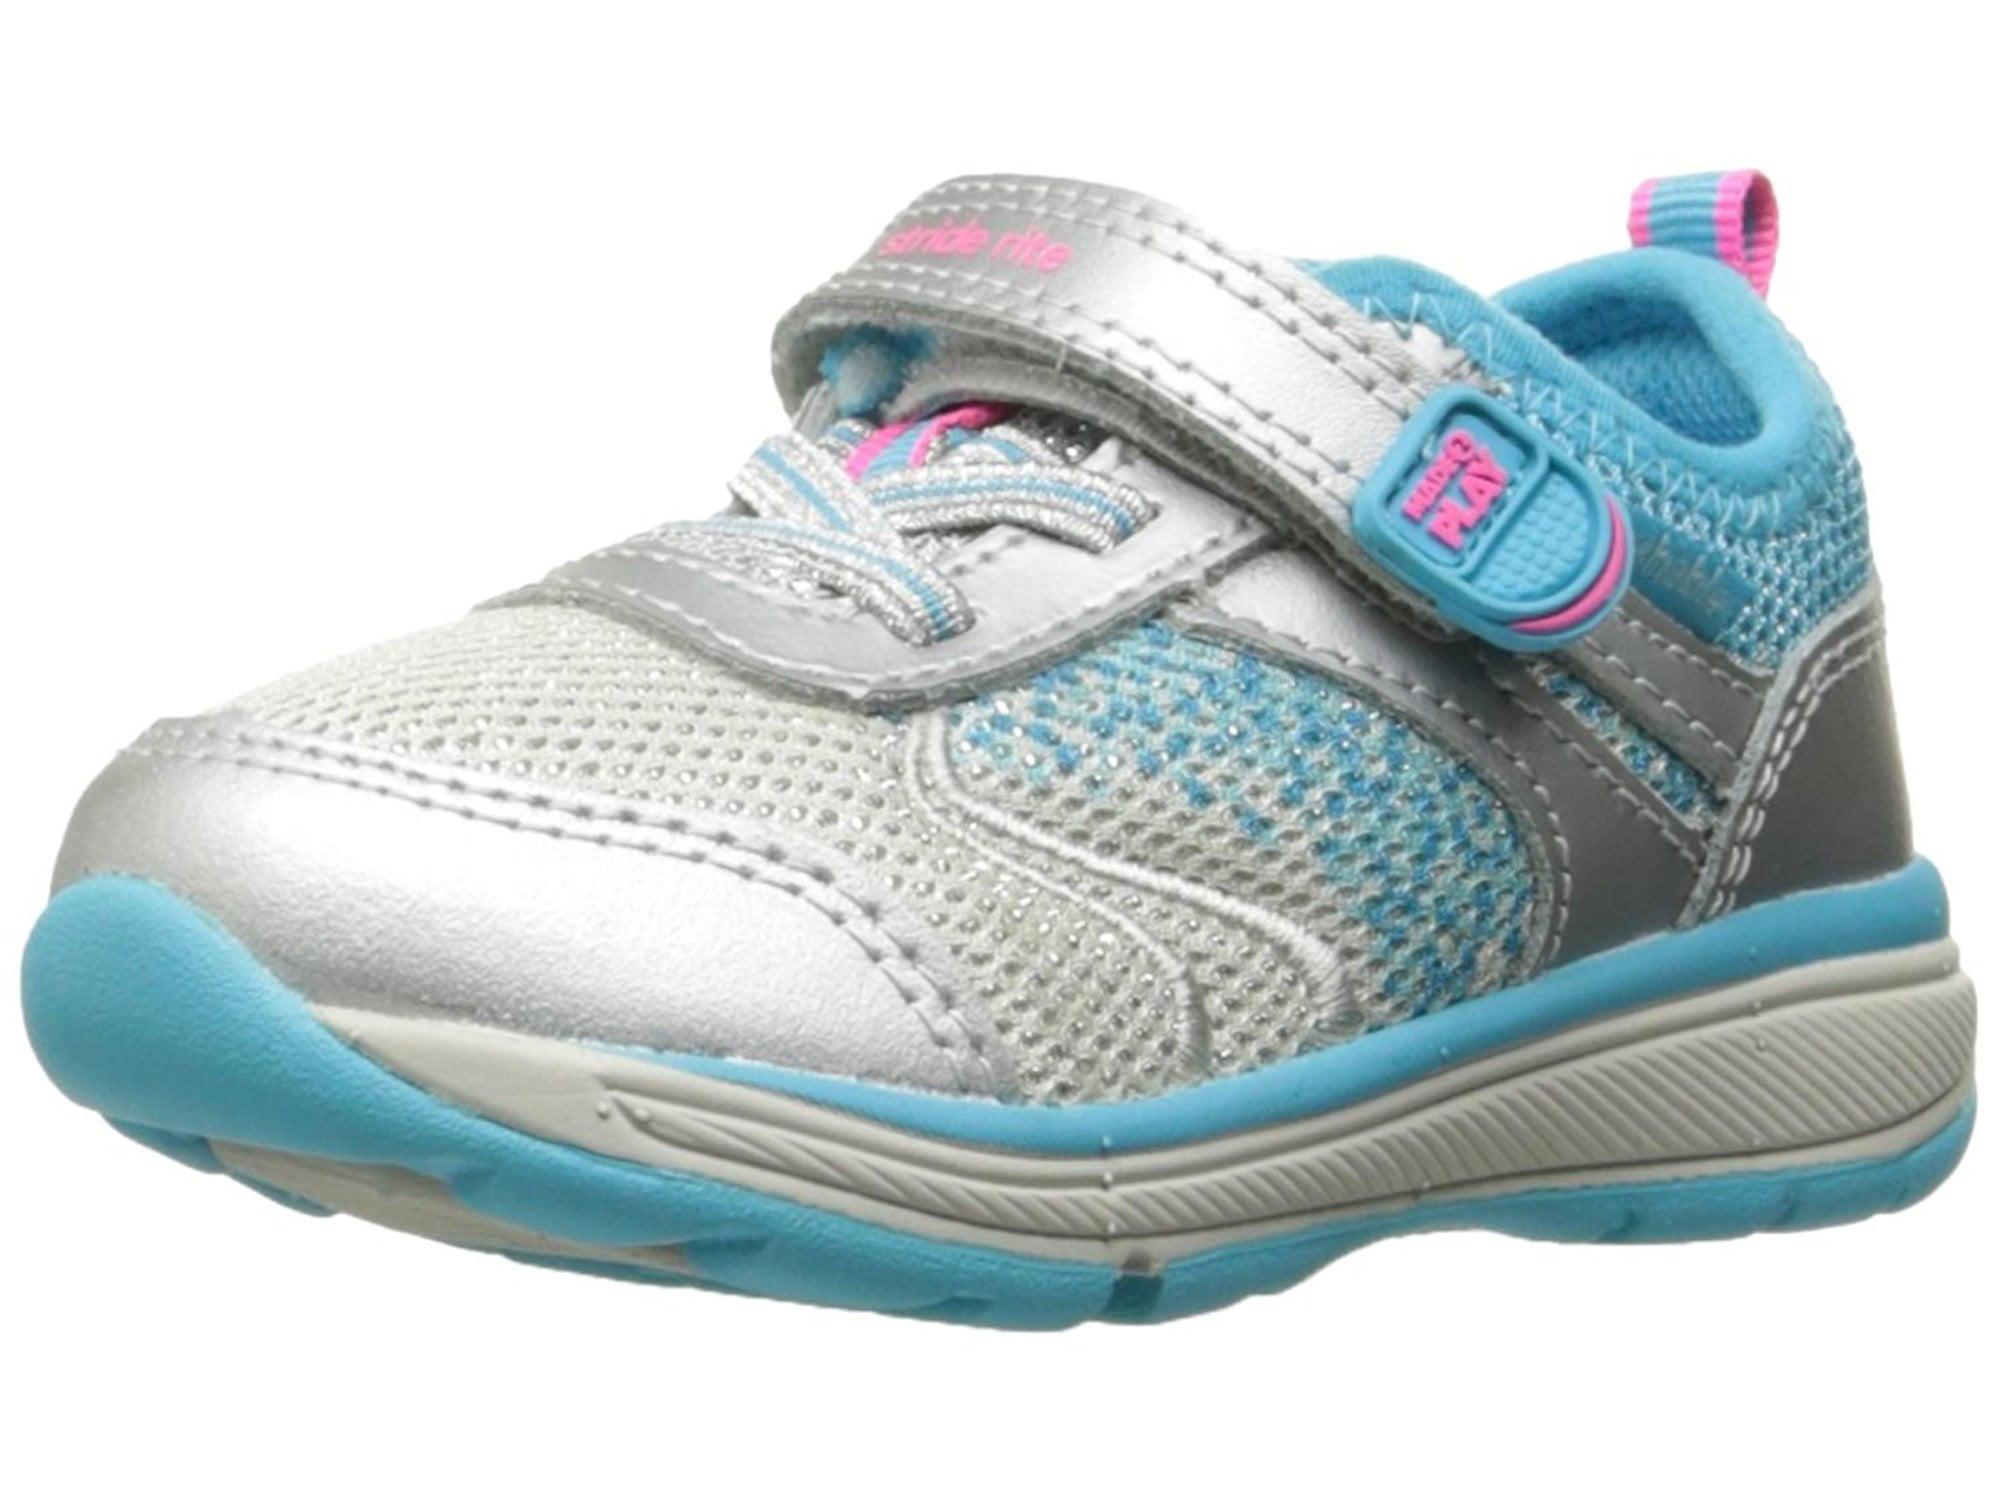 Stride Rite Girls Ellie Low Top Walking Shoes by Stride Rite